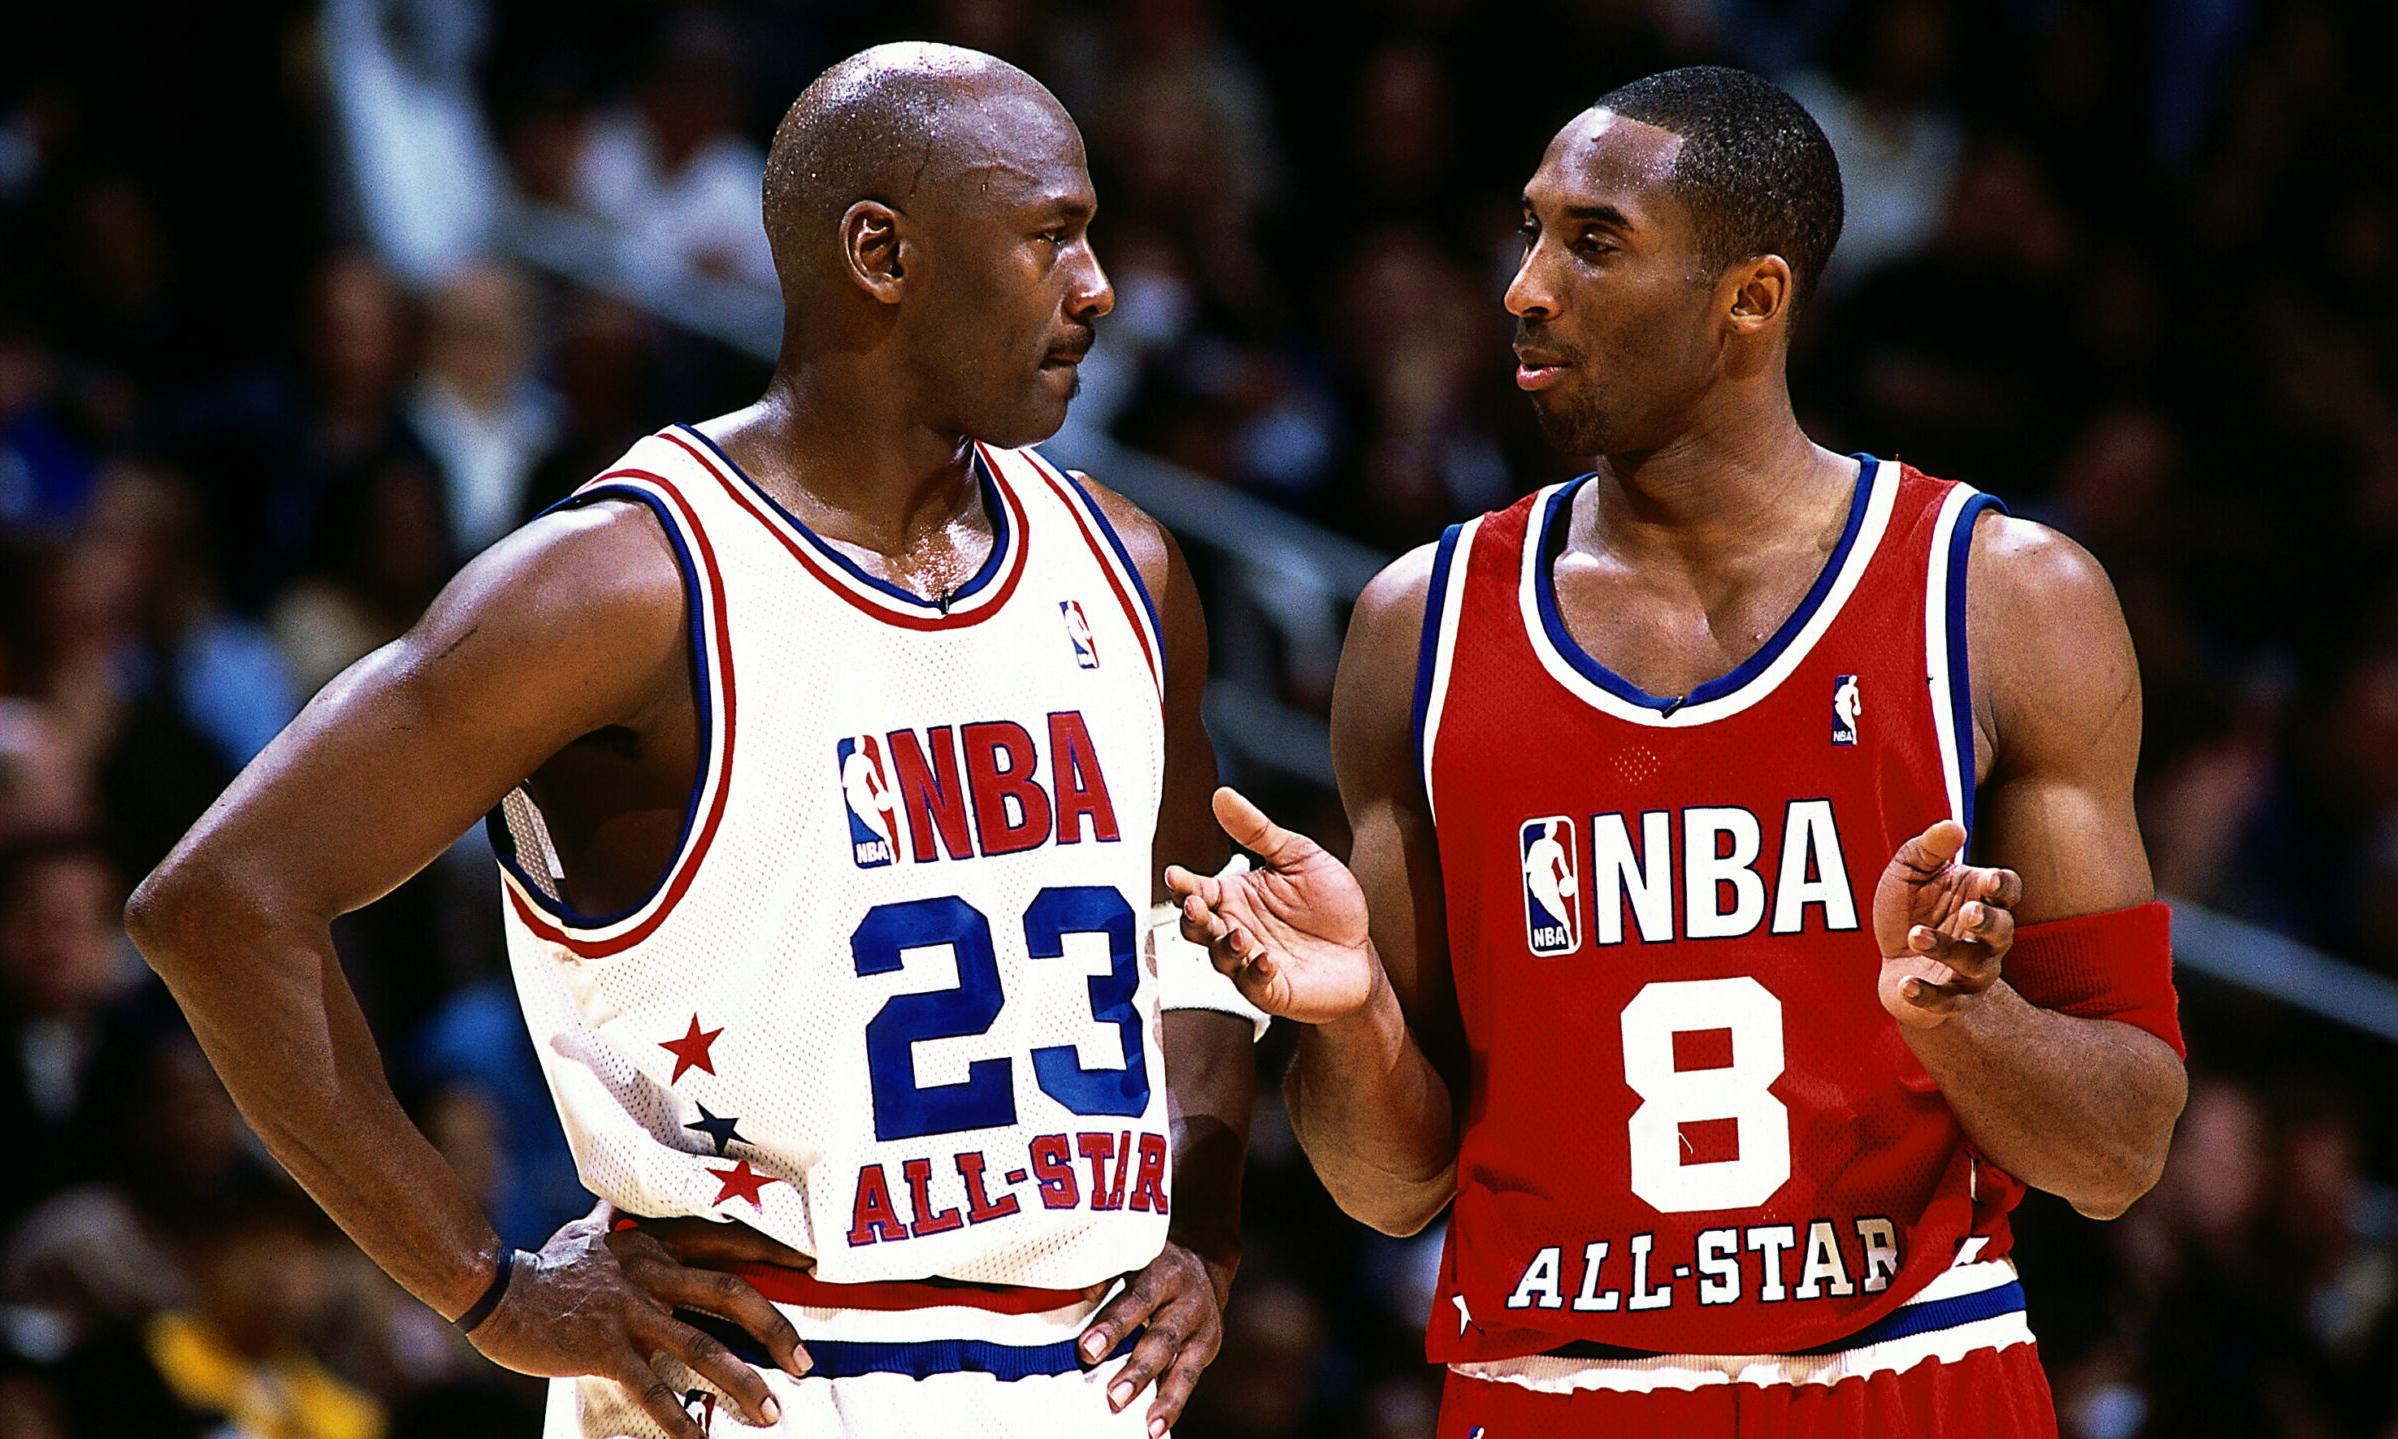 Michael Jordan 近日分享与 Kobe Bryant 最后的聊天短信